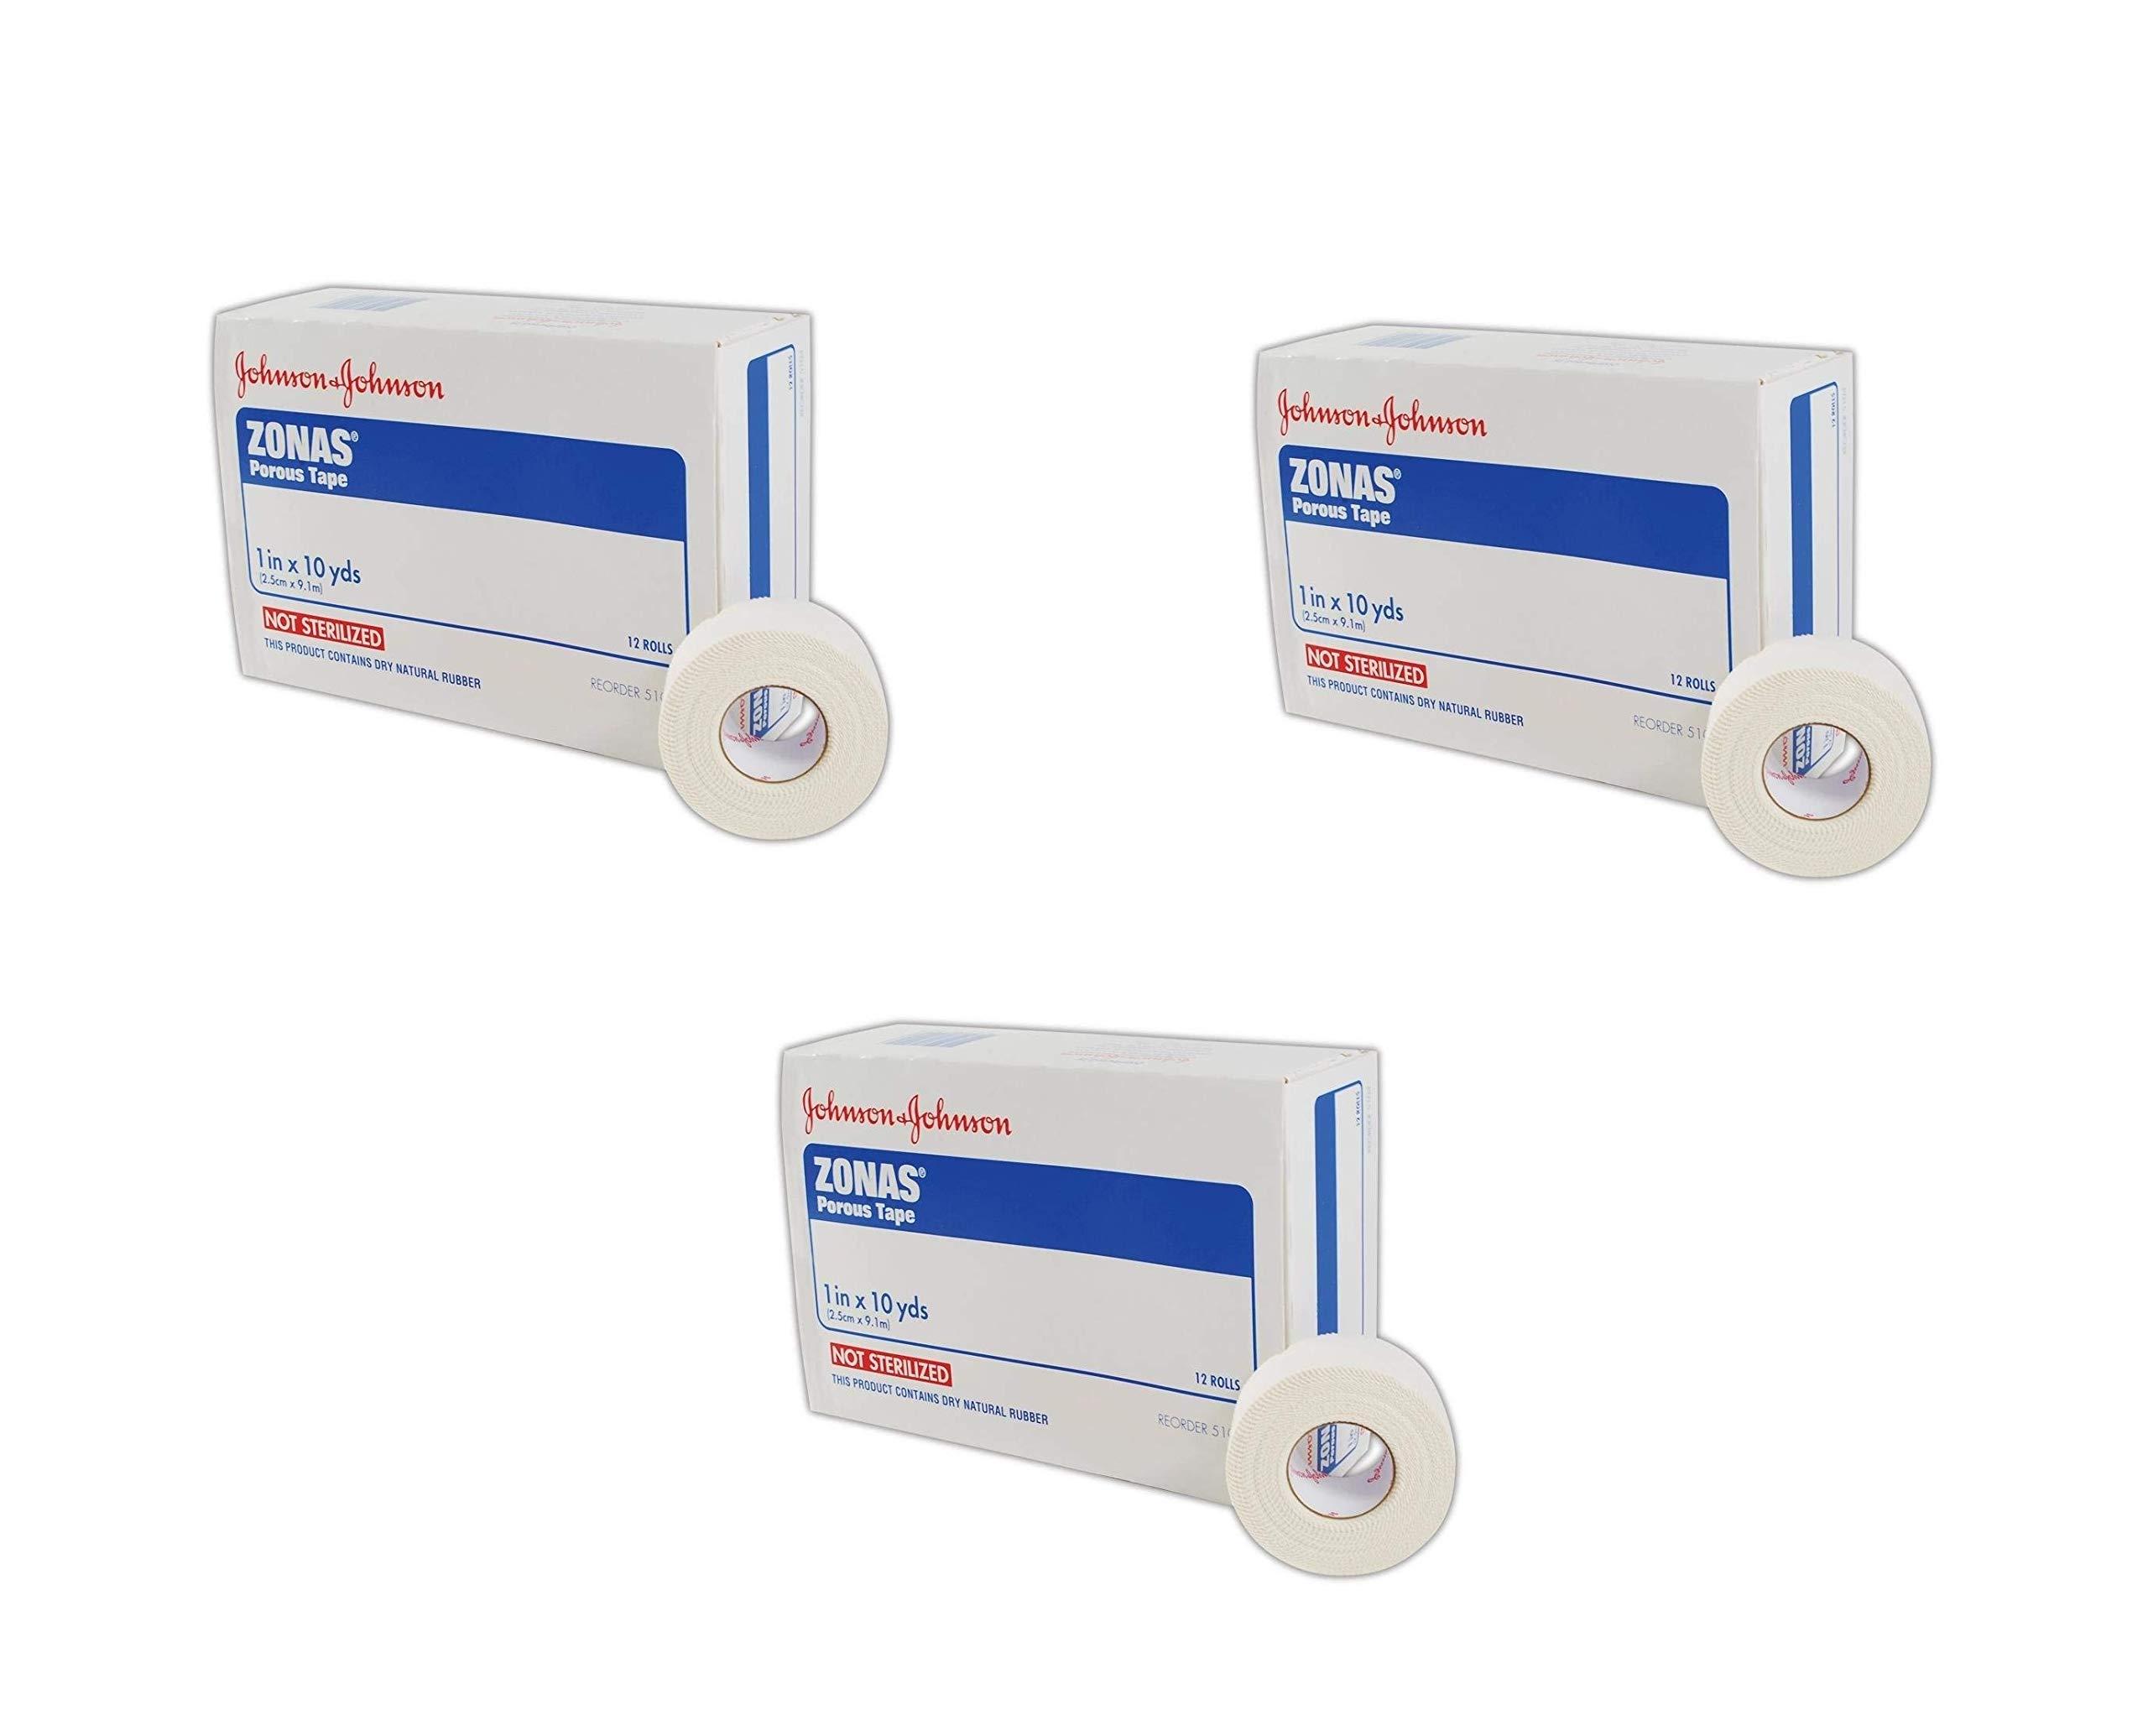 Johnson & Johnson JJ5104 Zonas Porous Adhesive Tape, 1'' x 10'', White, 12 Count (3 Pack)